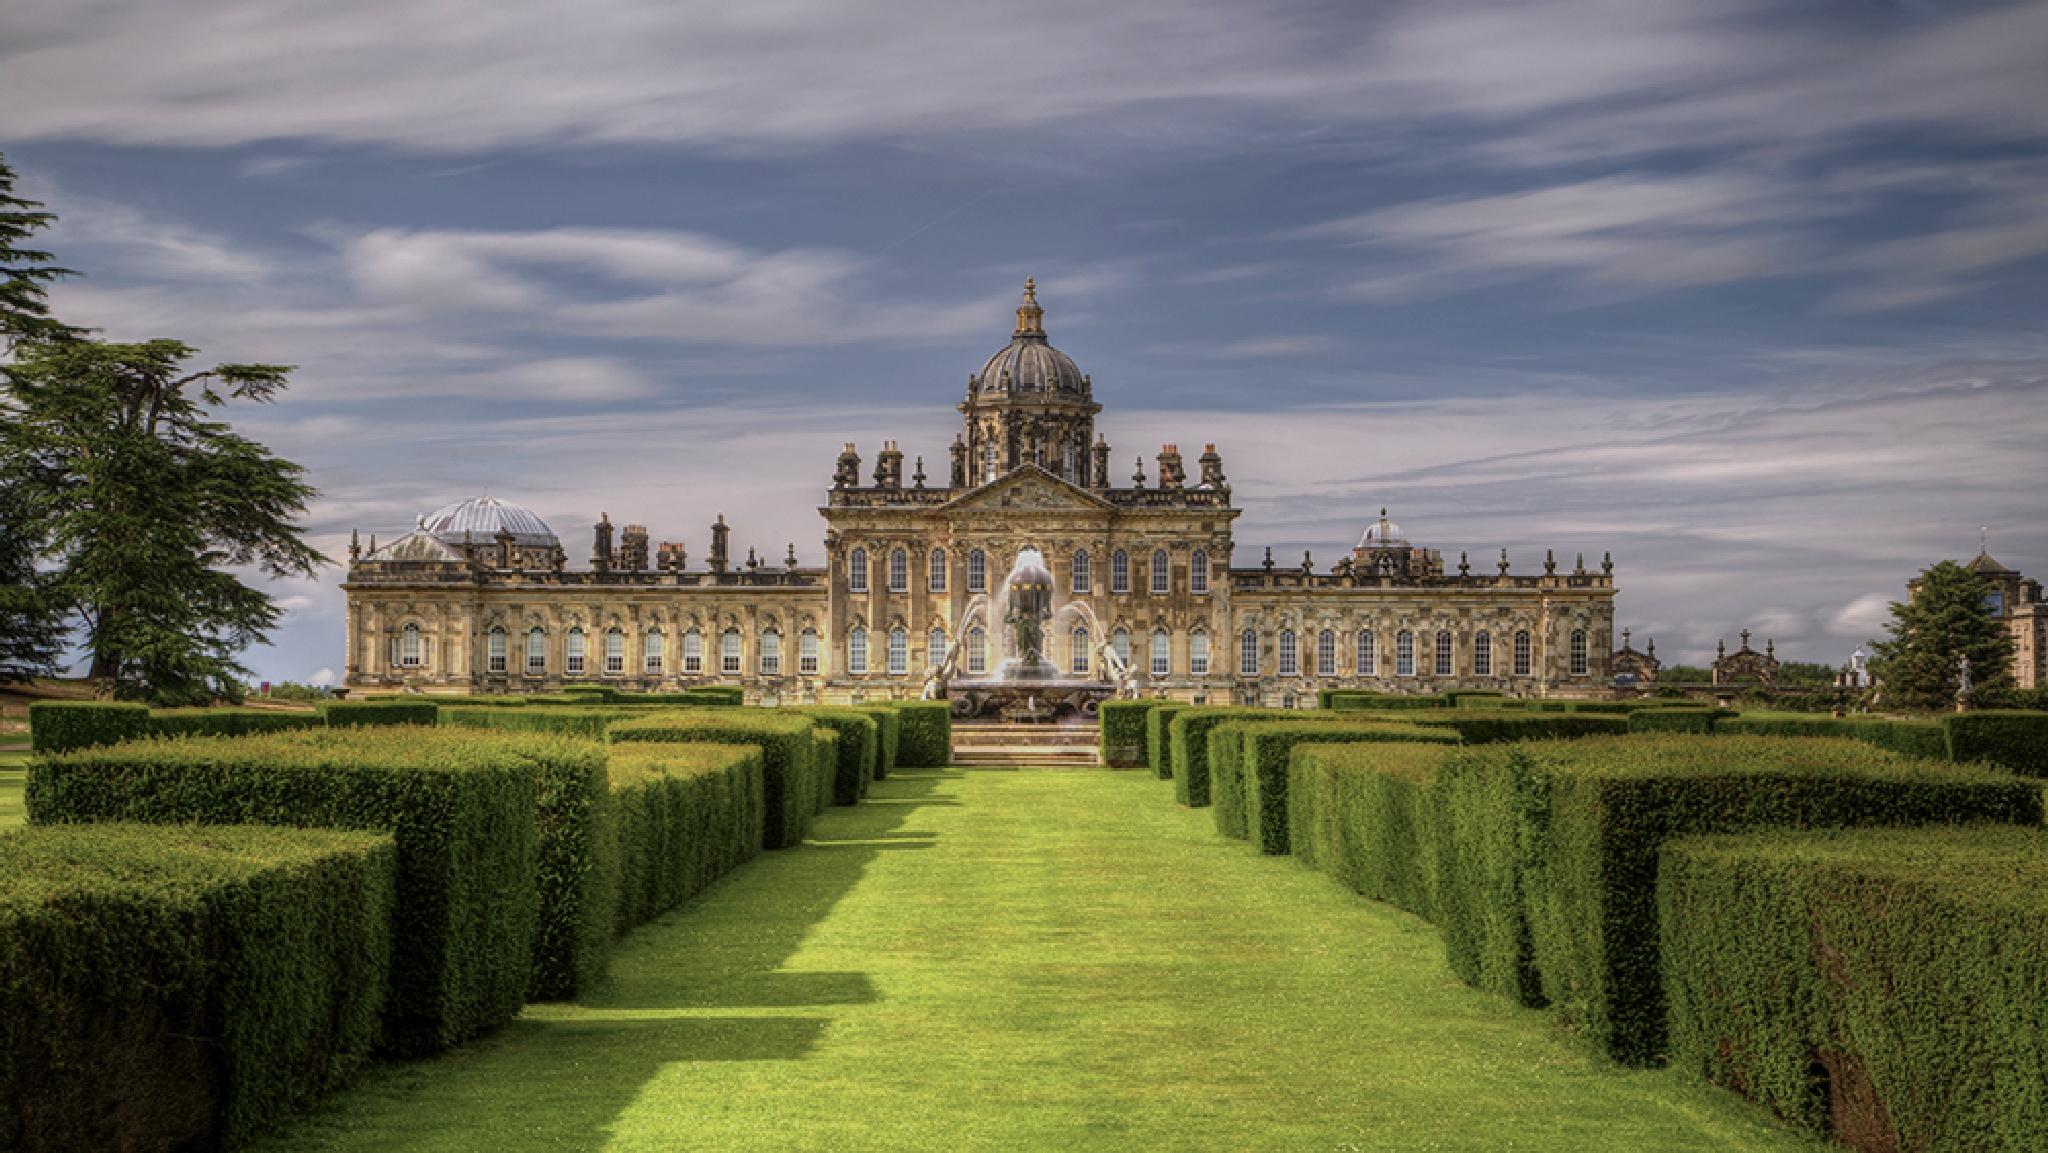 castle howard formal by kbr61263